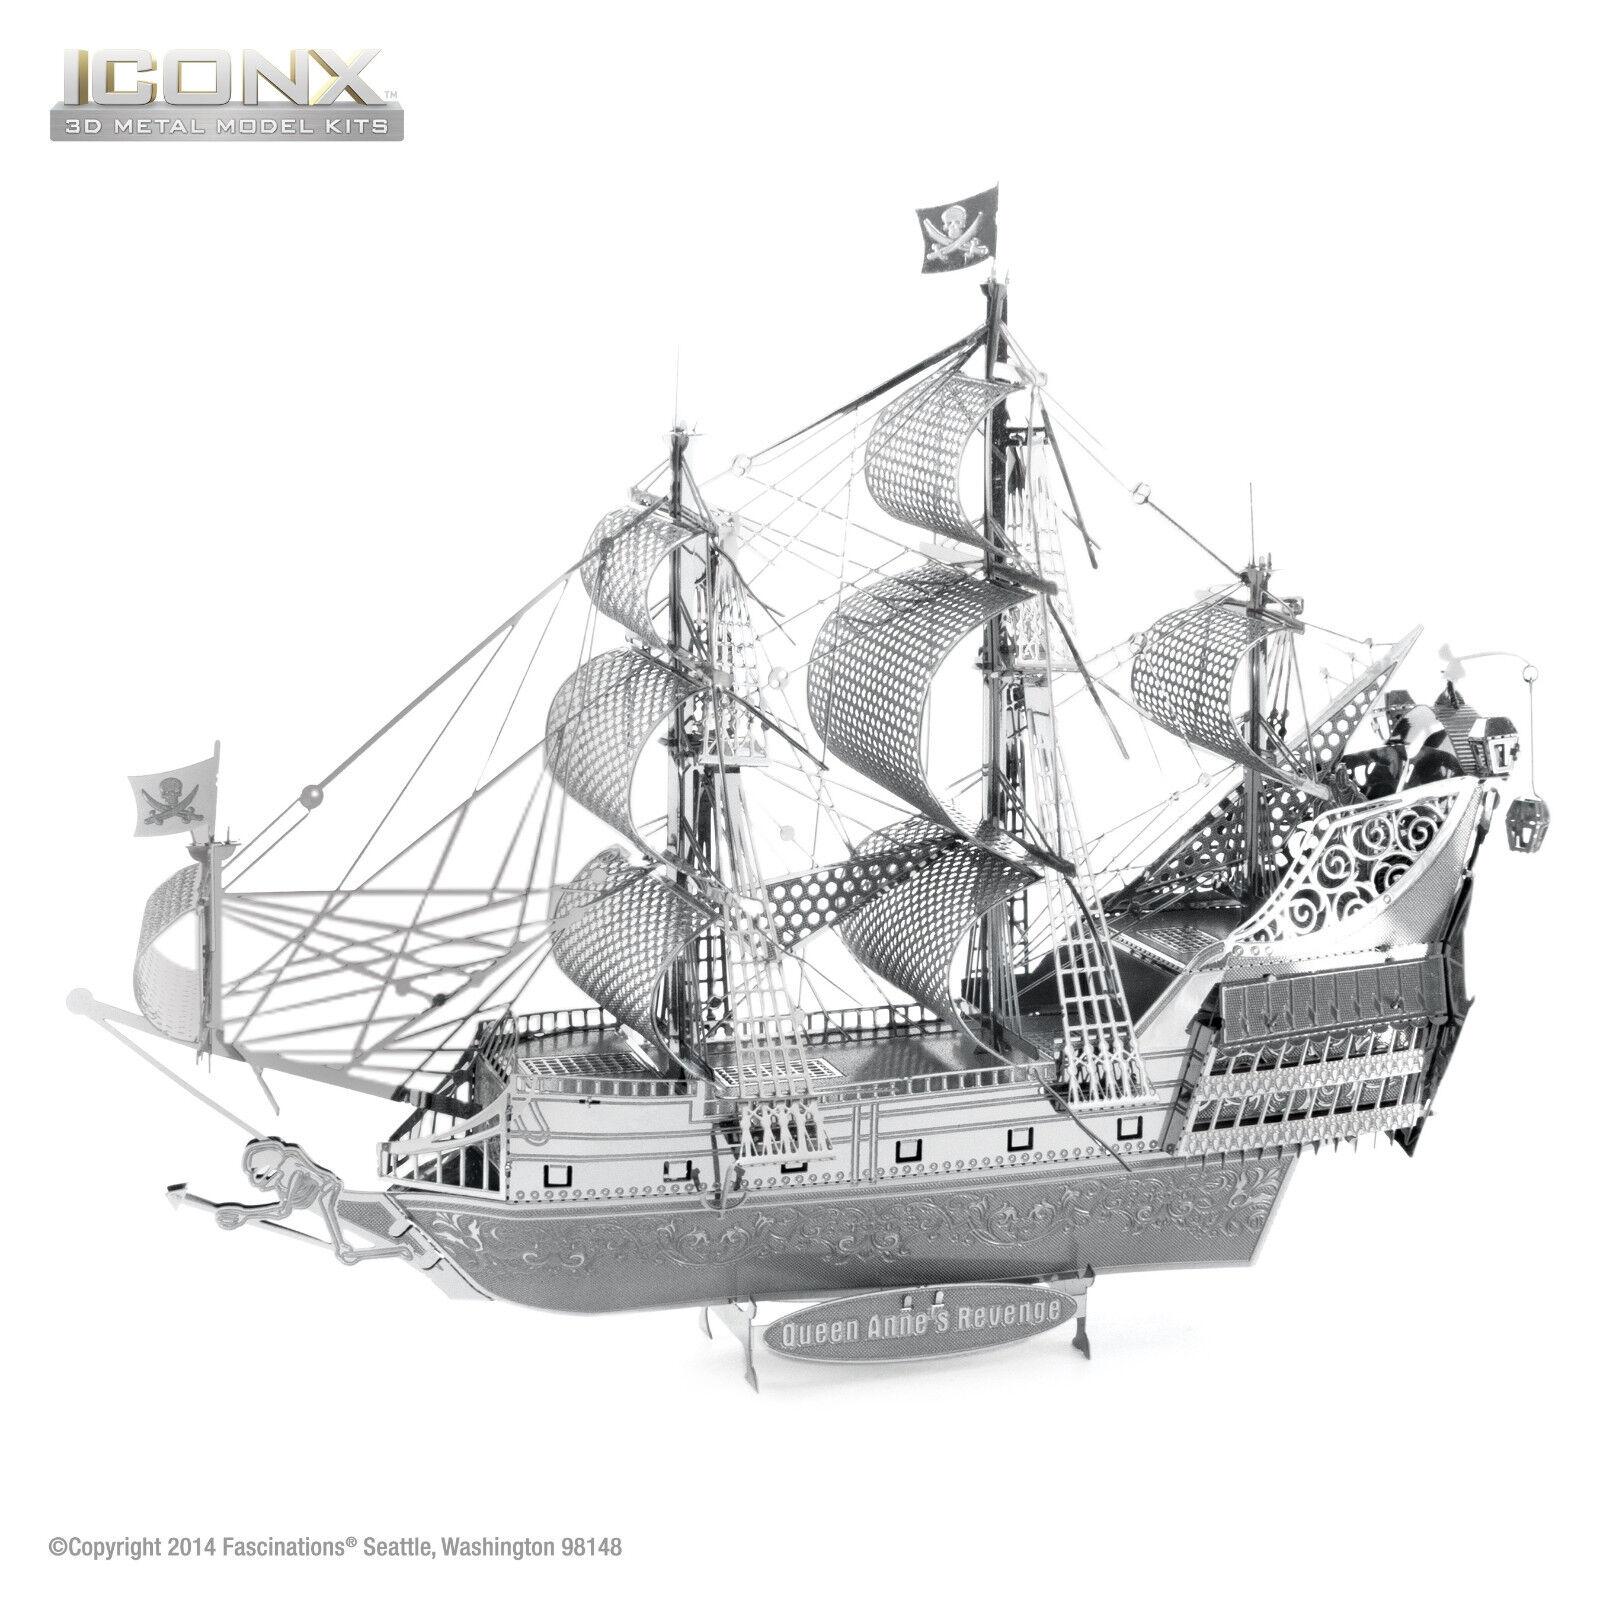 Fascinations ICONX Queen Anne Revenge Ship 3D Metal Earth La